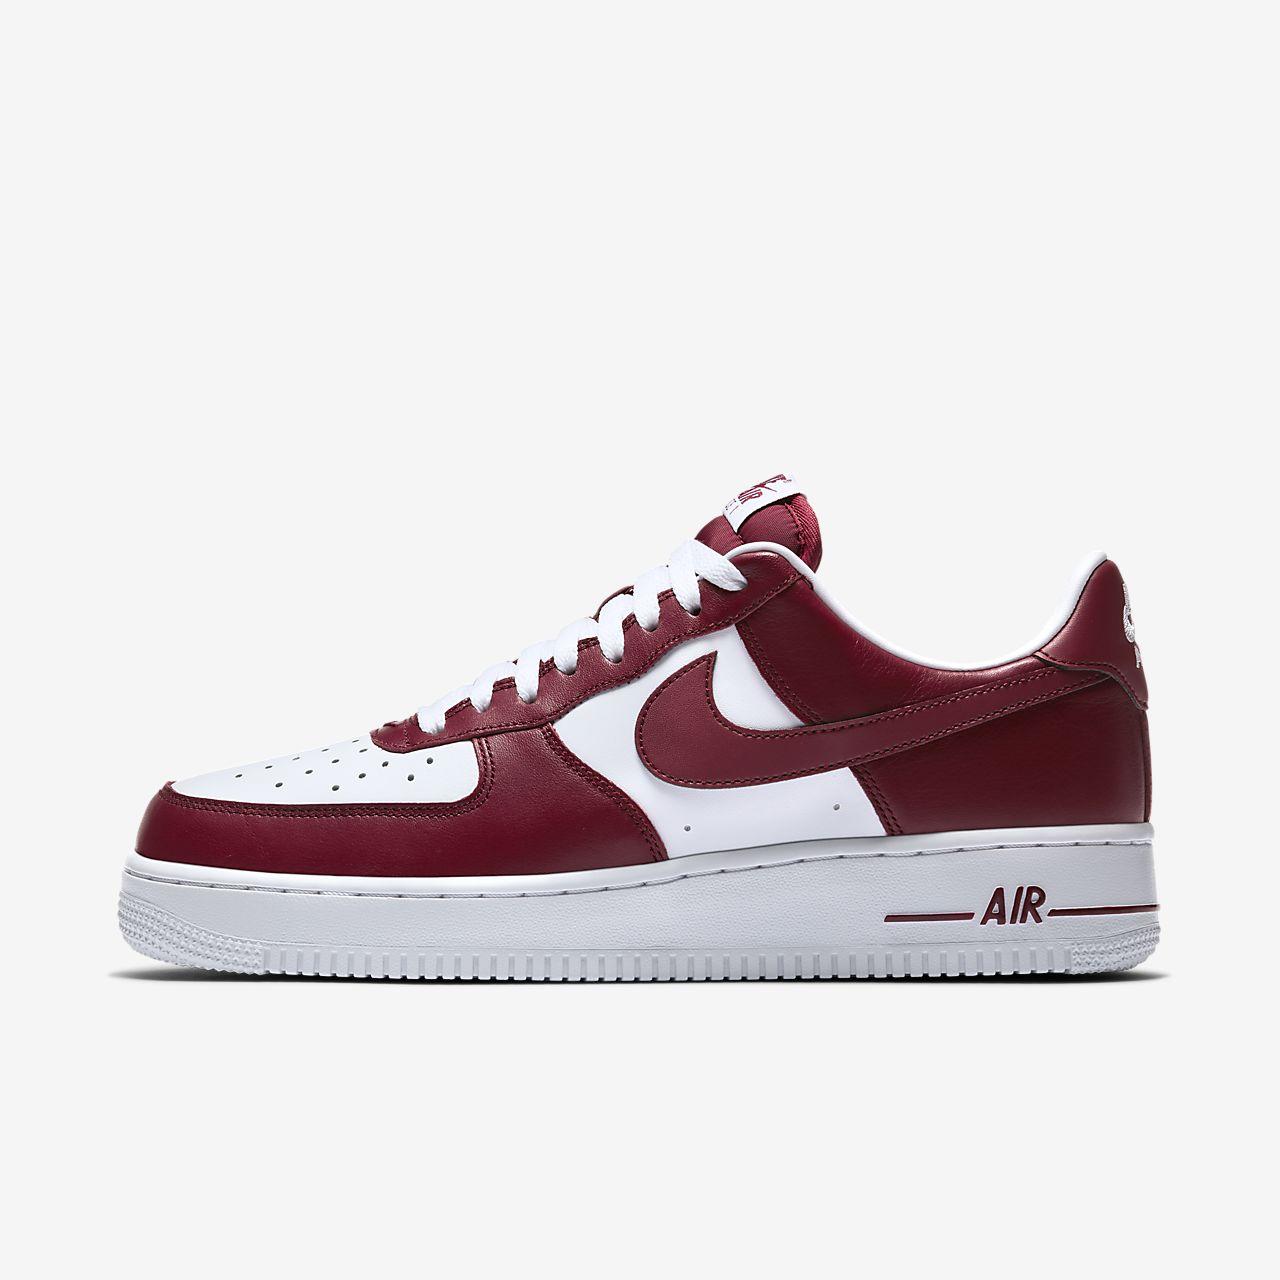 Nike Air Force 1 Low Herrenschuh      | Guter Markt  7ca82d